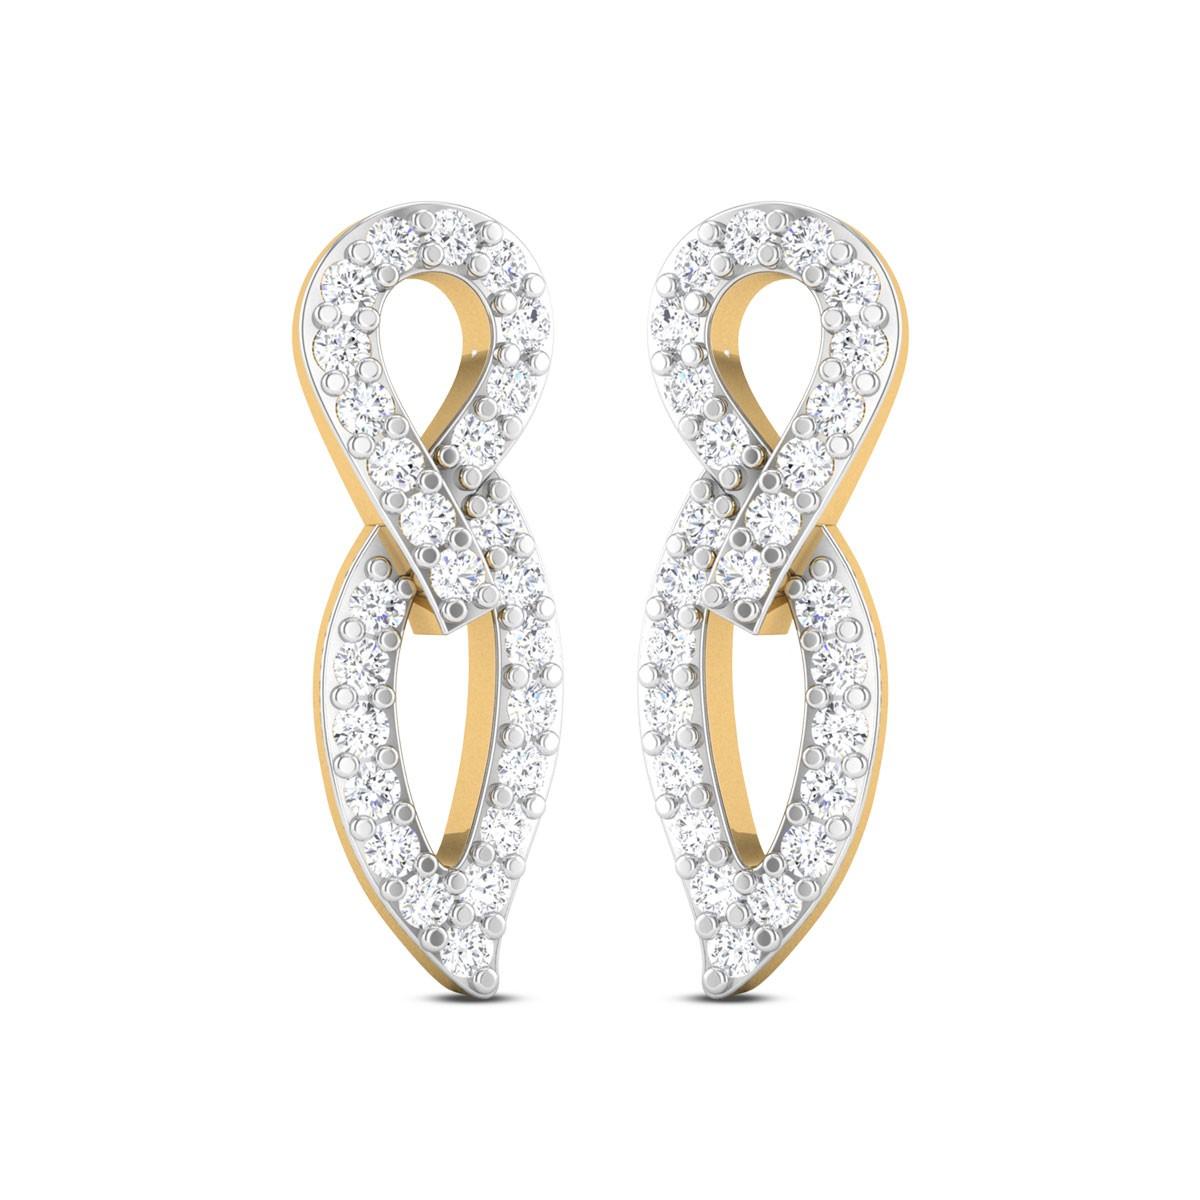 Darian Diamond Stud Earrings